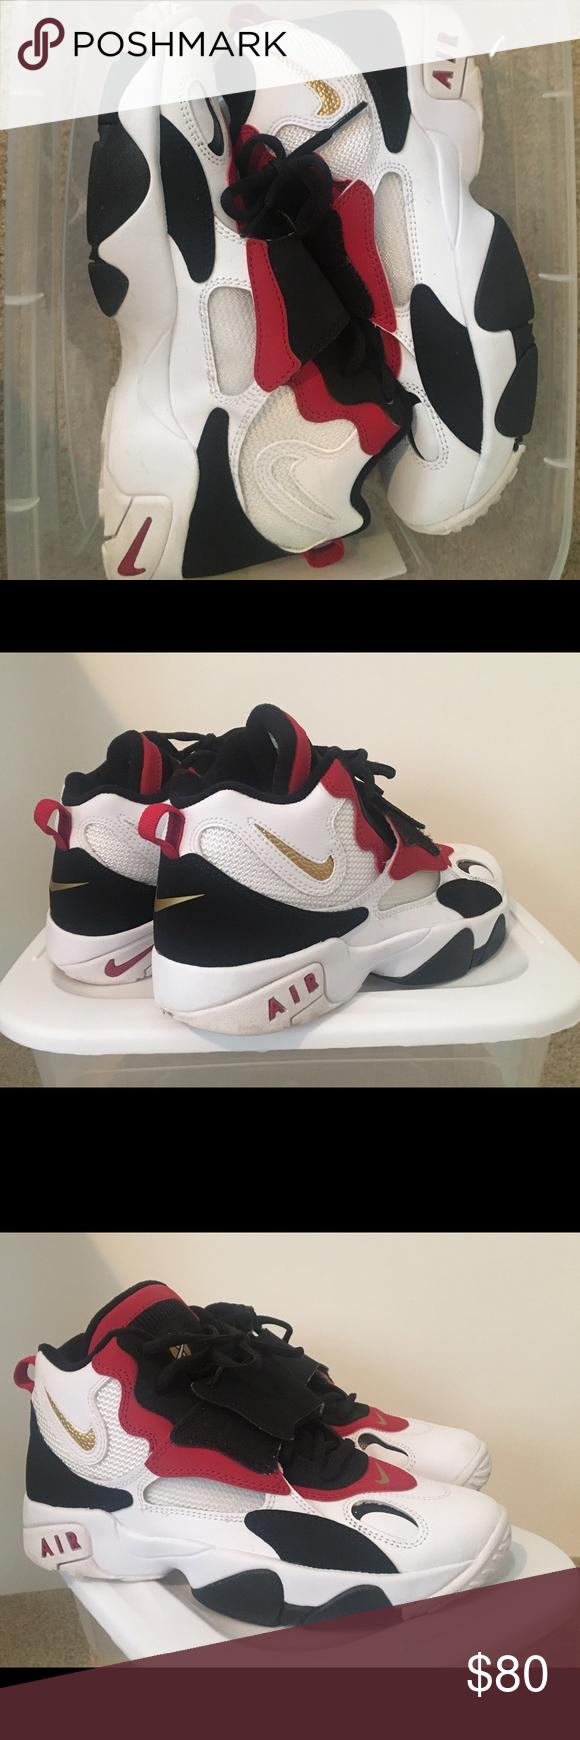 new styles 2bade c44c5 Nike Air Speed Turf Deion Sanders 49ers Edition Big Kids ...